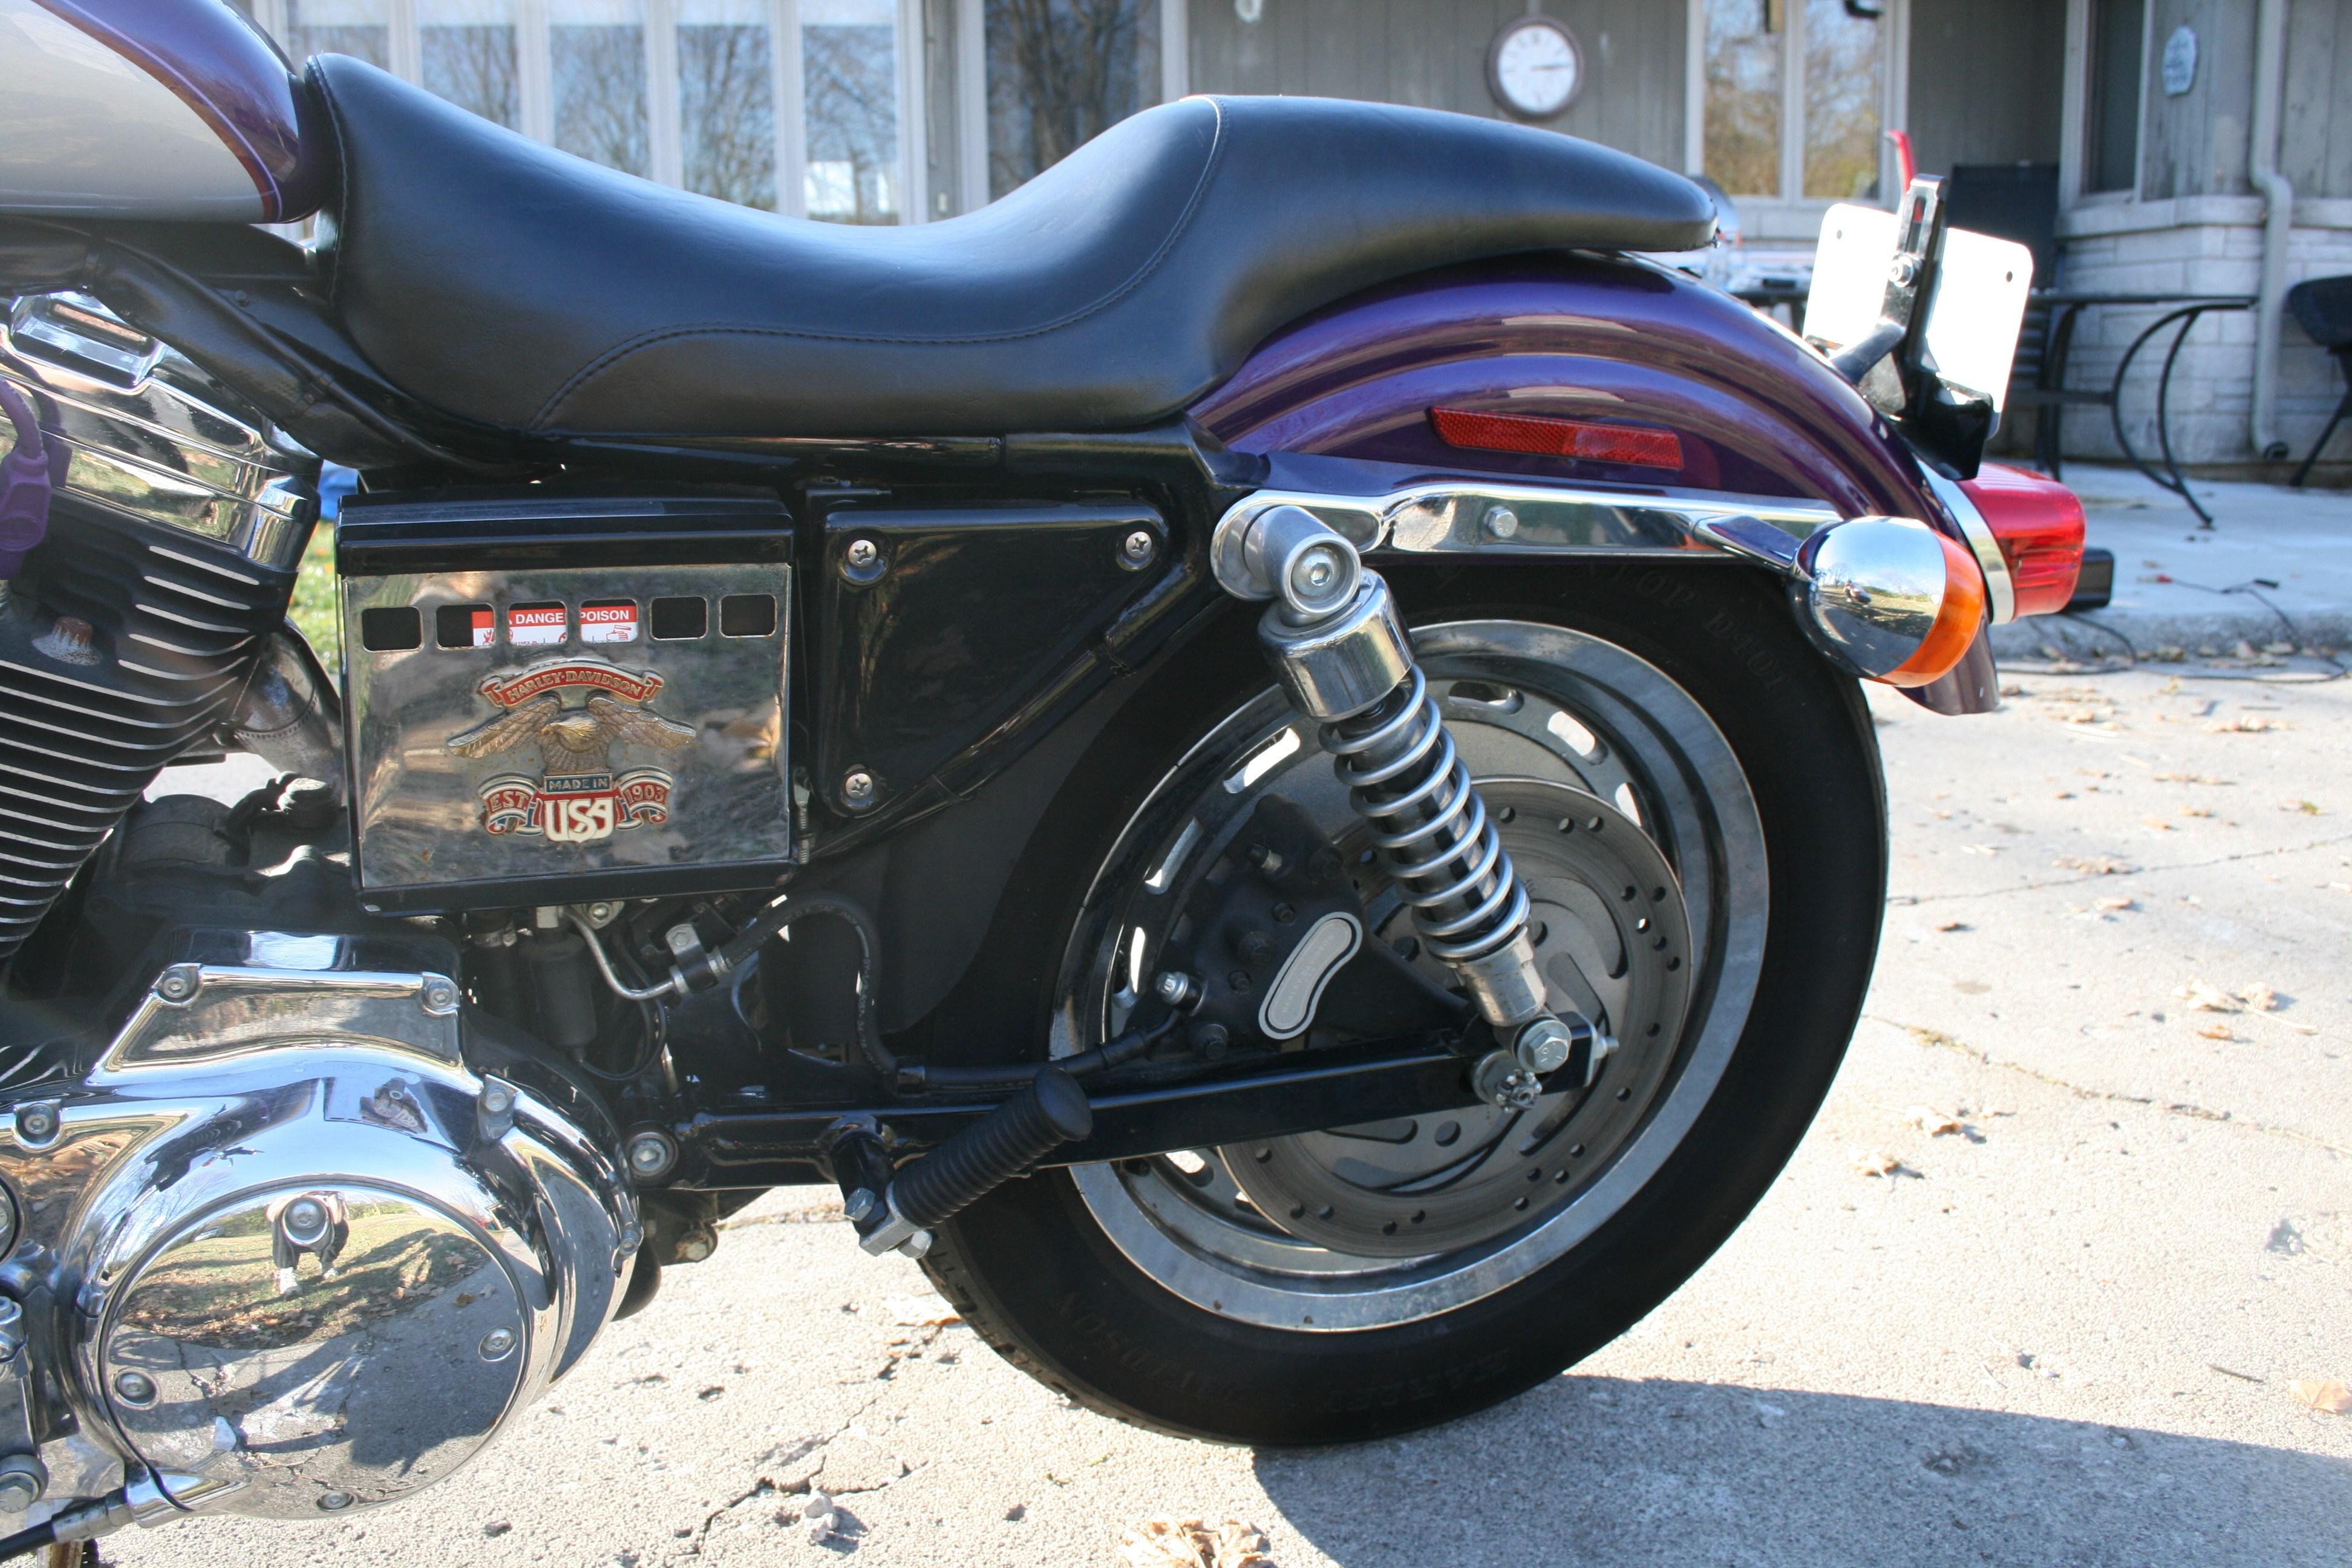 Richmond Indiana Harley Davidson Dealer